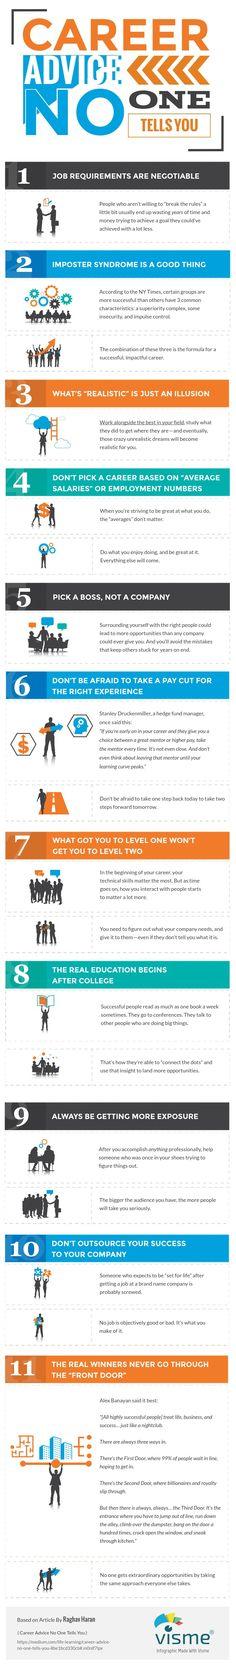 Career Advice No One Tells You — Life Learning — Medium